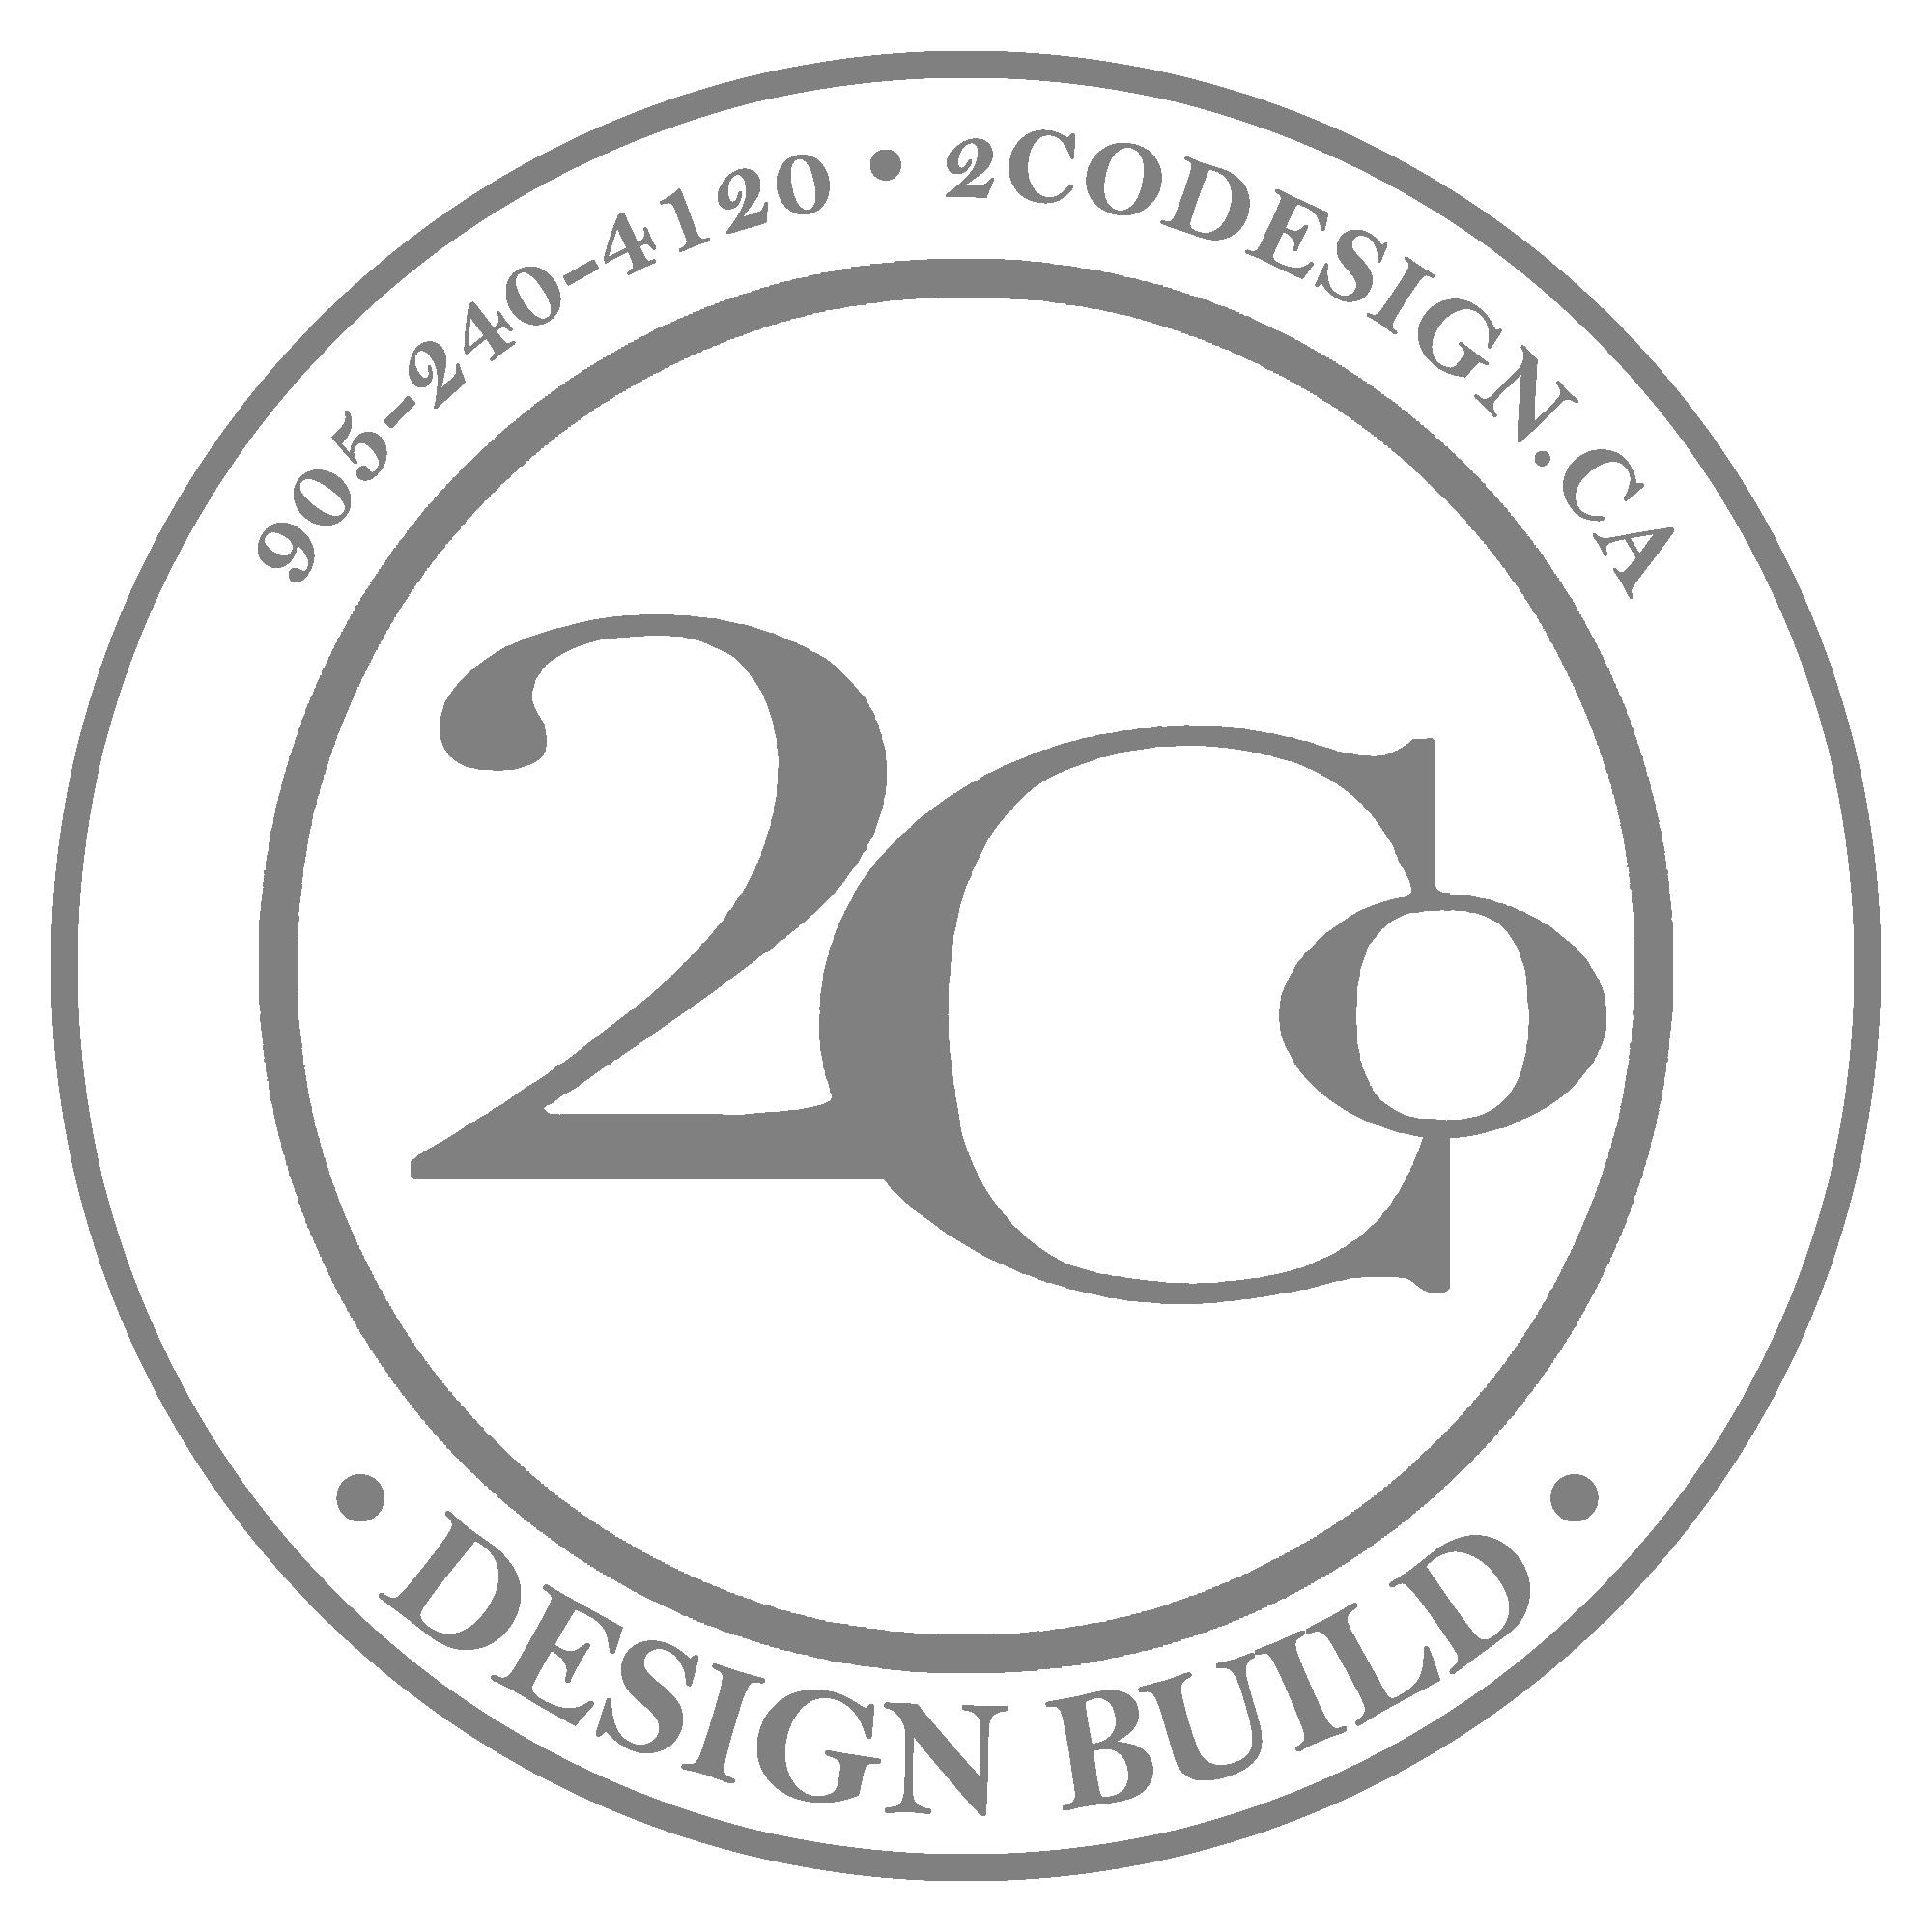 2Co.Design Build